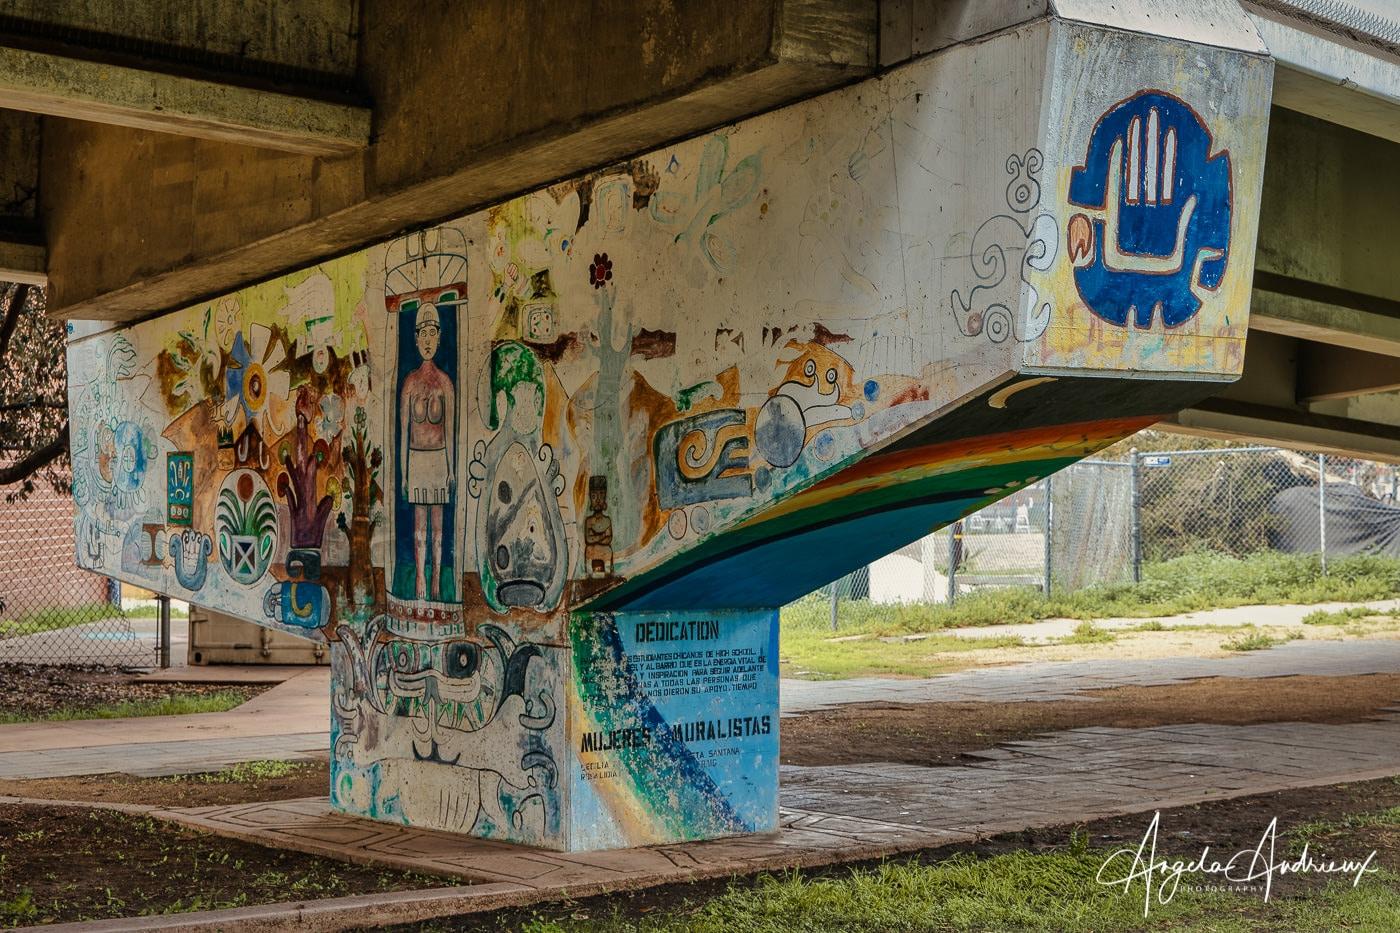 Freeway underpass painting mural in Barrio Logan, San Diego